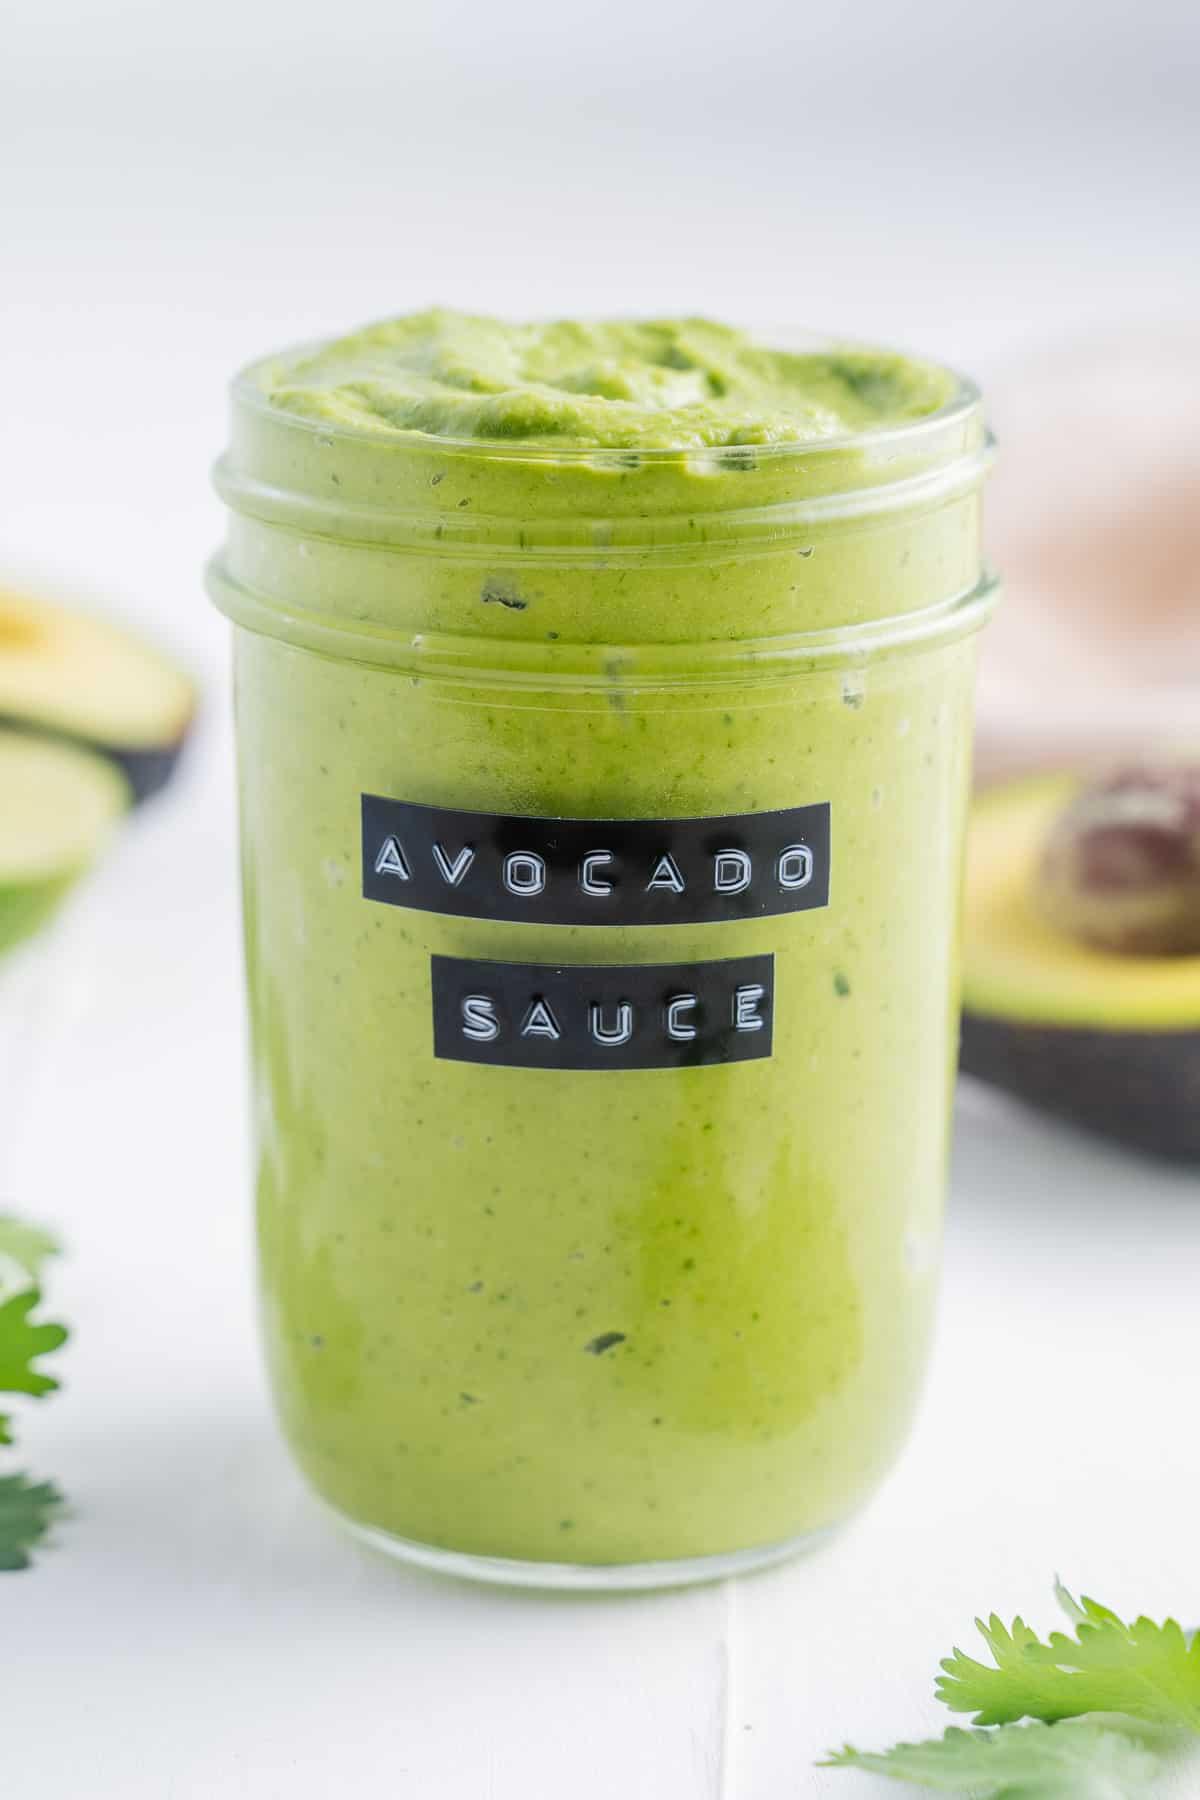 Avocado Sauce in a Jar